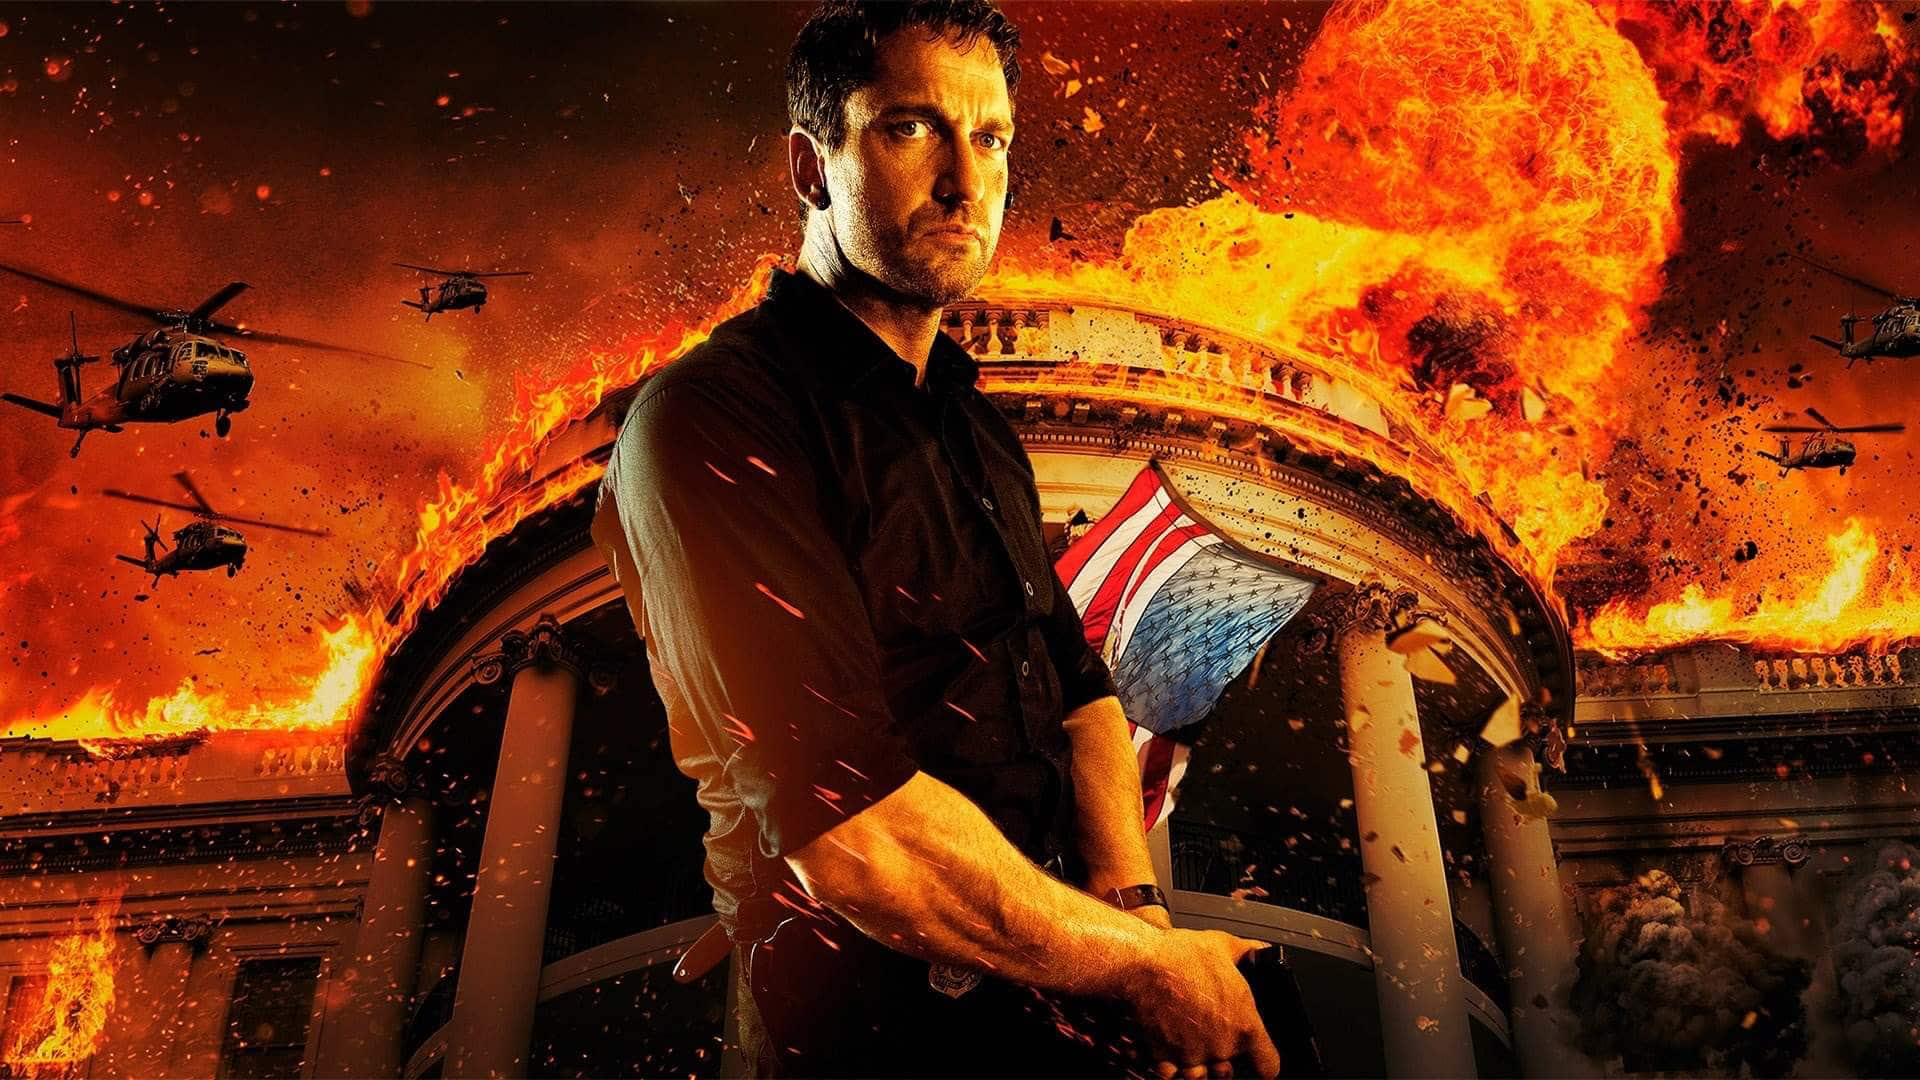 Gerard Butlerov 'Has Fallen' serijal mogao bi dobiti još tri filma, a možda i TV seriju